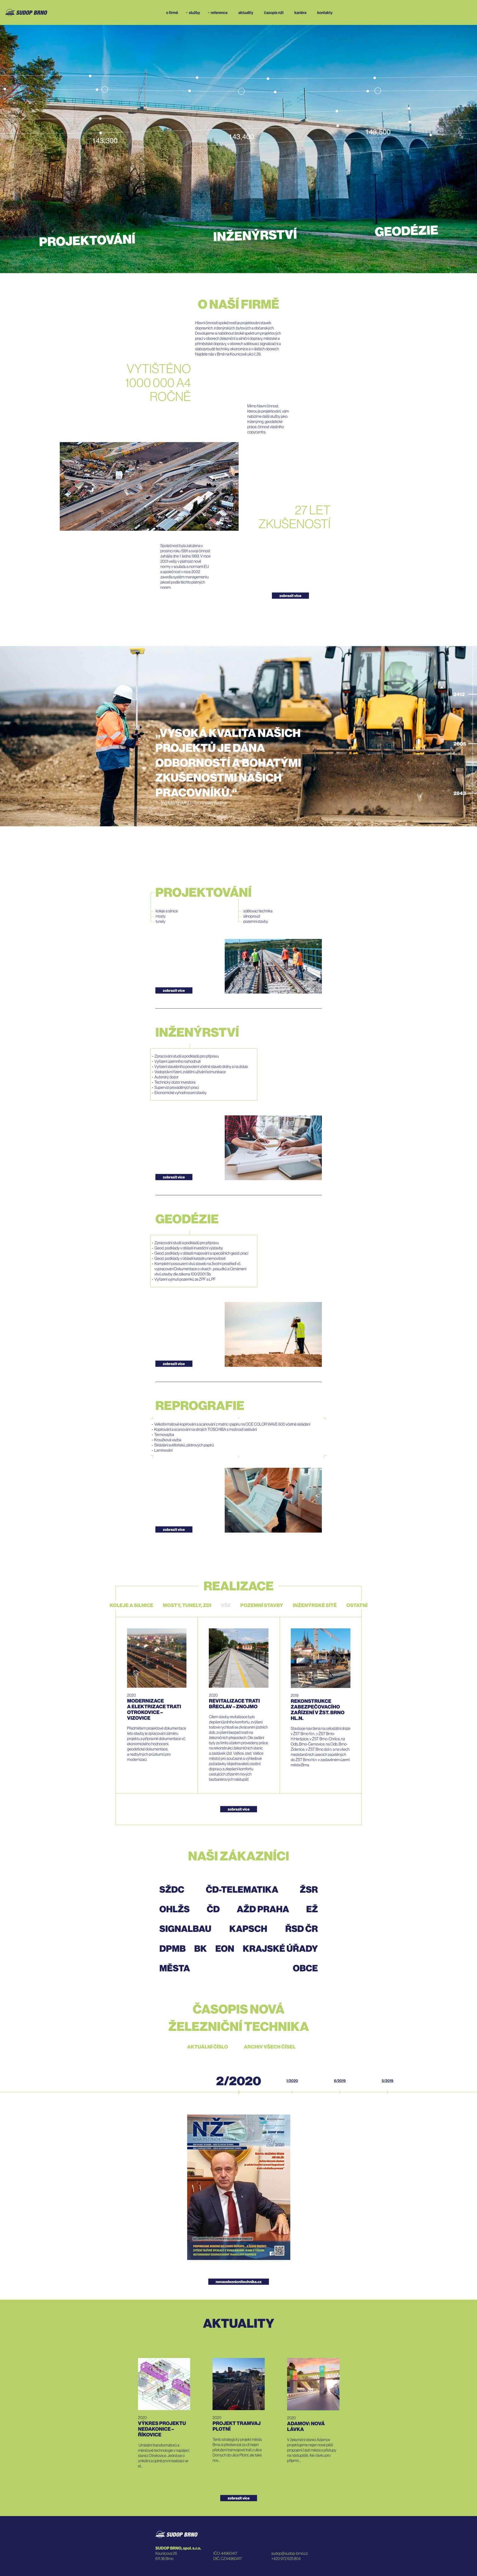 Sudop Brno - realizace, Webdesign